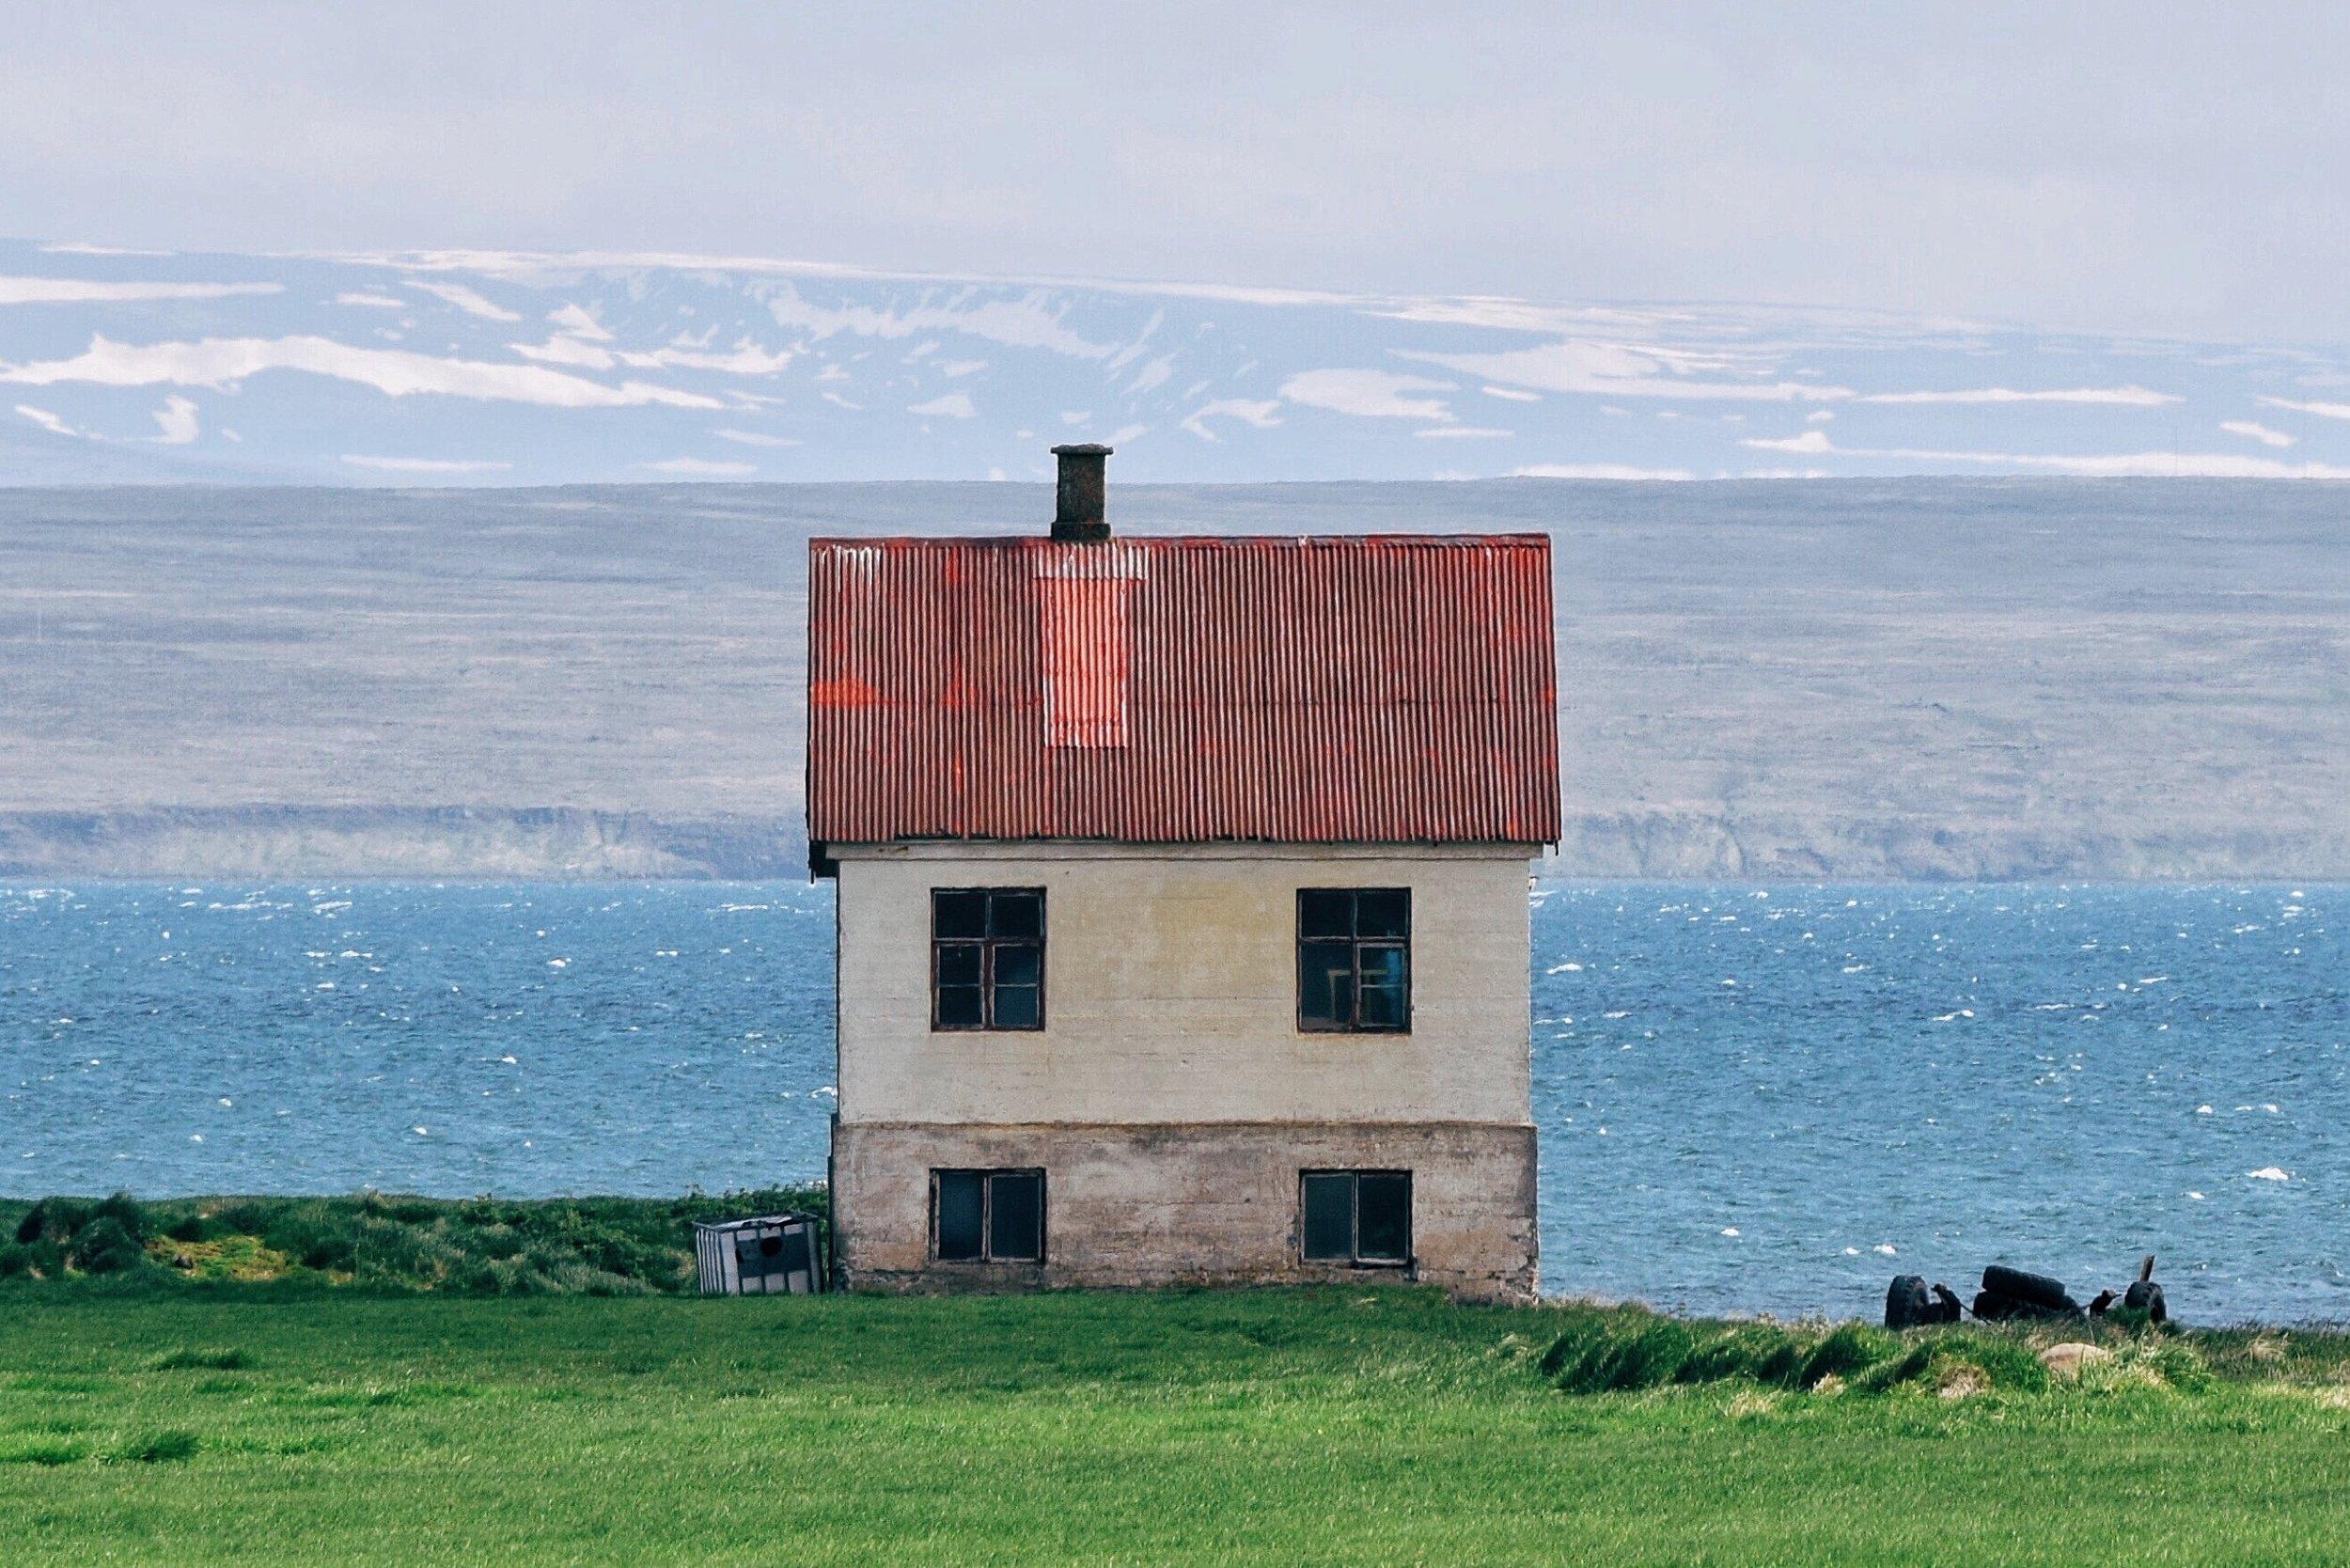 Wes-Anderson-set-director-movie-colour-Iceland-Matthijs-Van-Mierlo.jpg